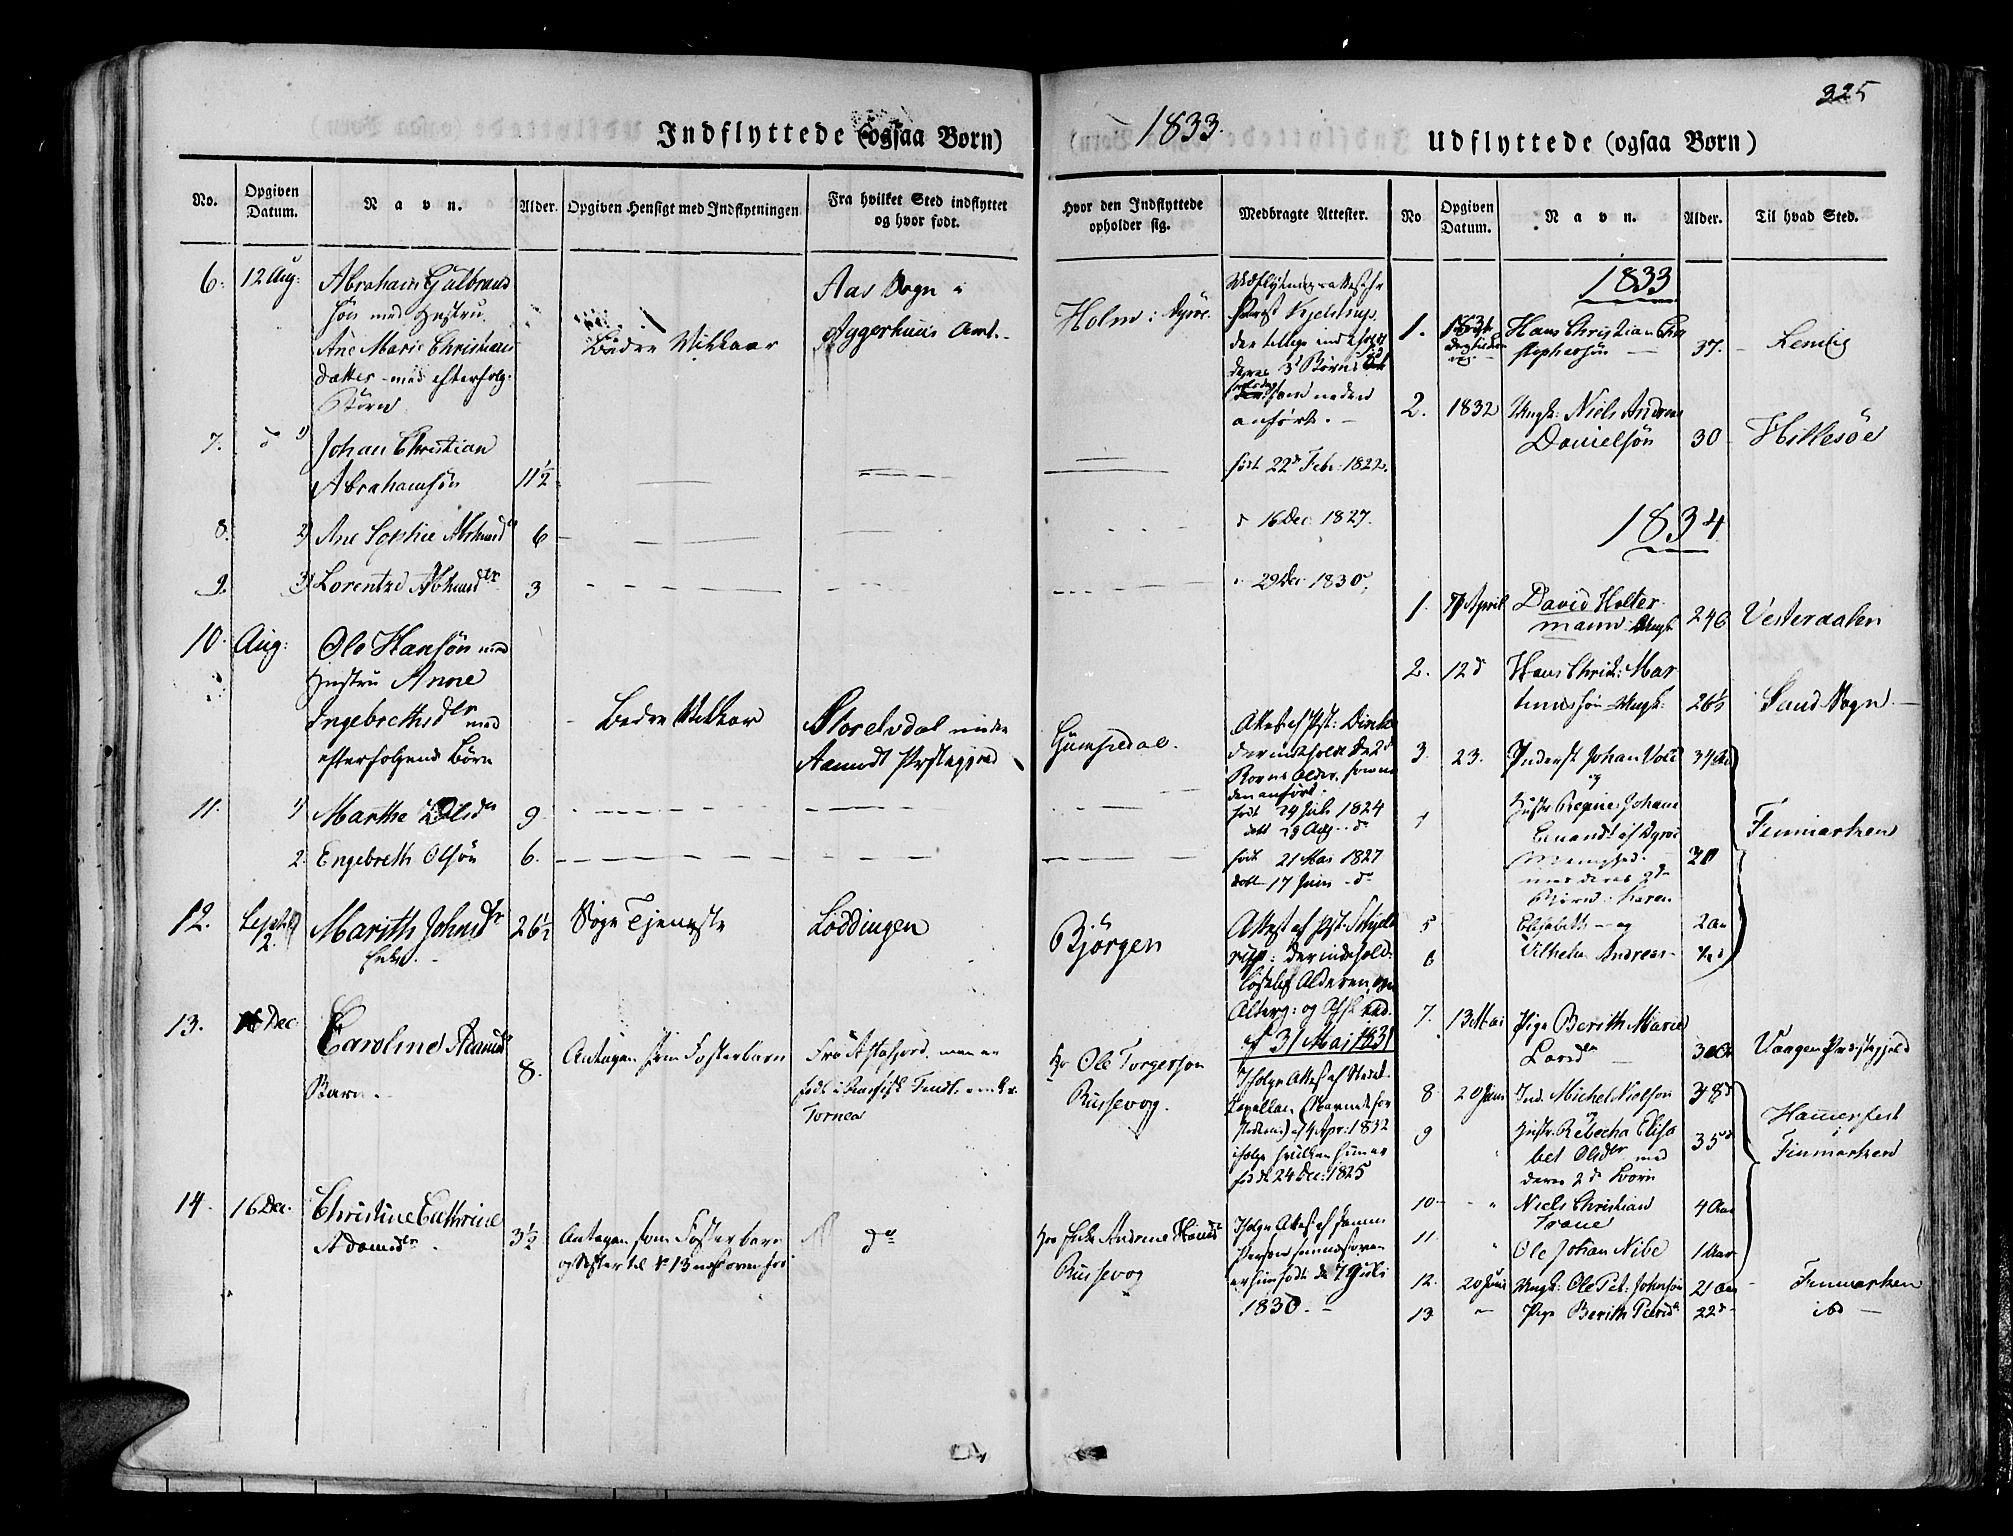 SATØ, Tranøy sokneprestkontor, I/Ia/Iaa/L0005kirke: Ministerialbok nr. 5, 1829-1844, s. 325